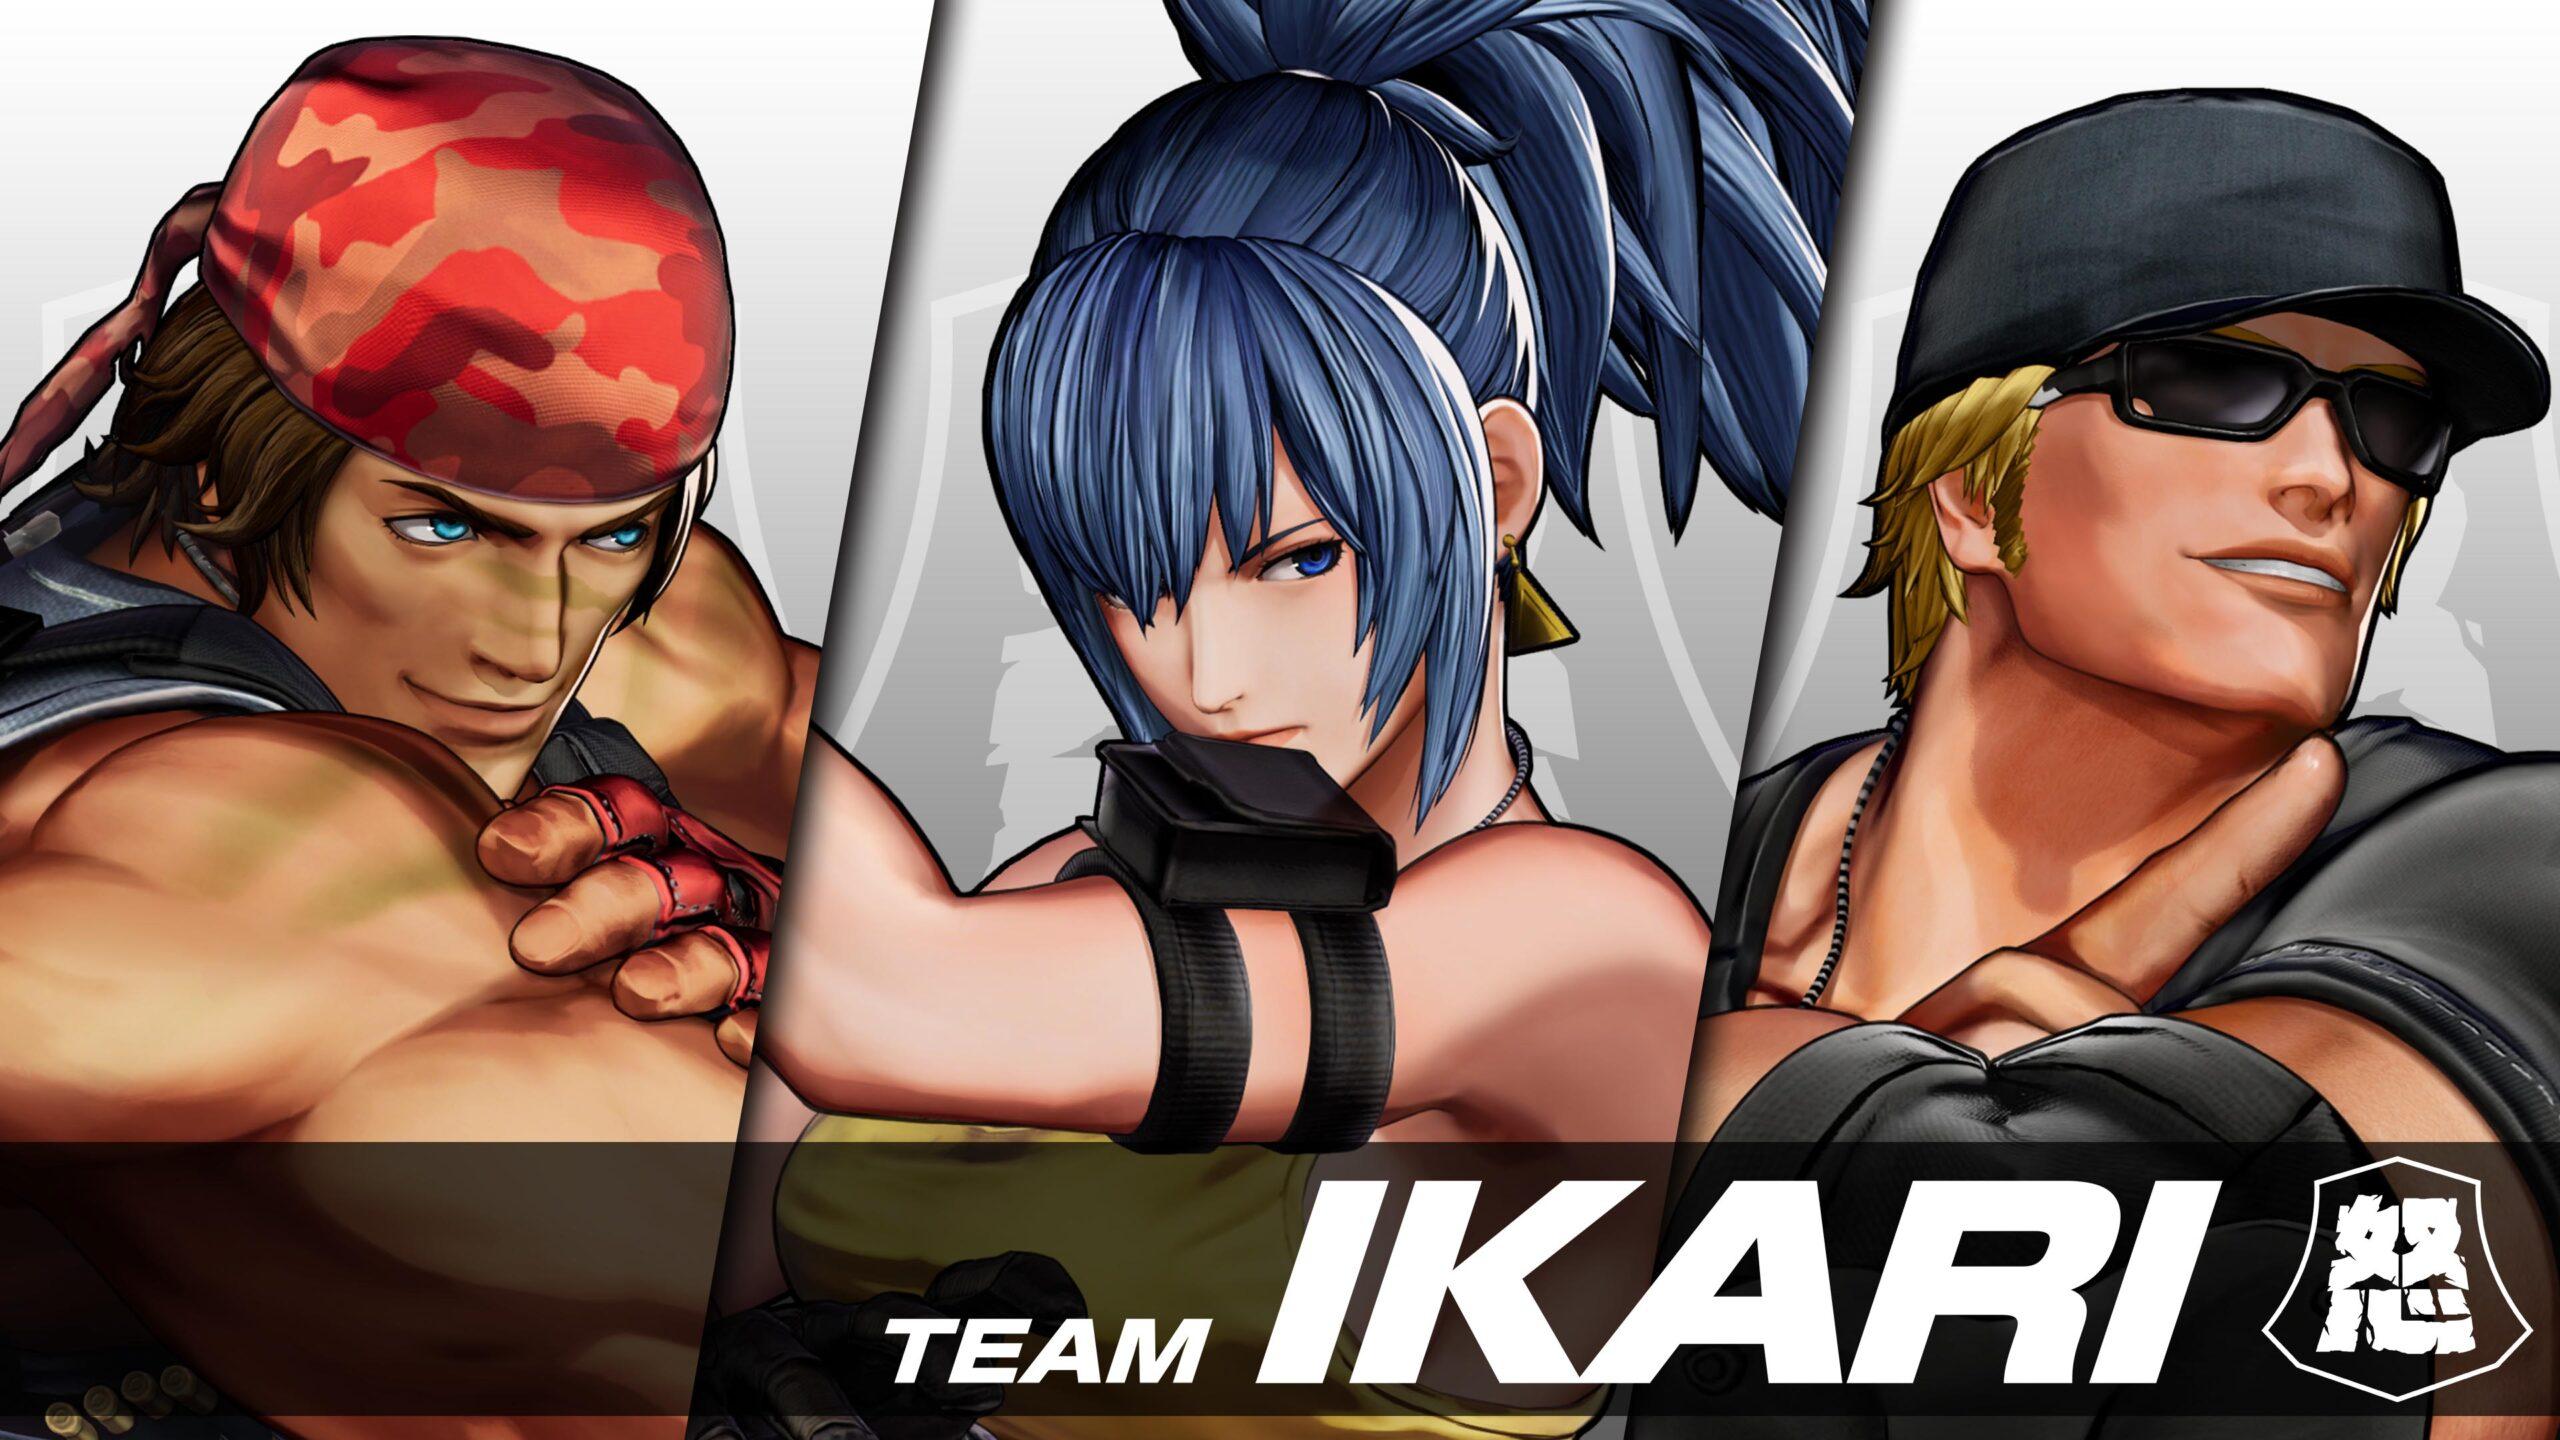 The King of Fighters XV Team Ikari